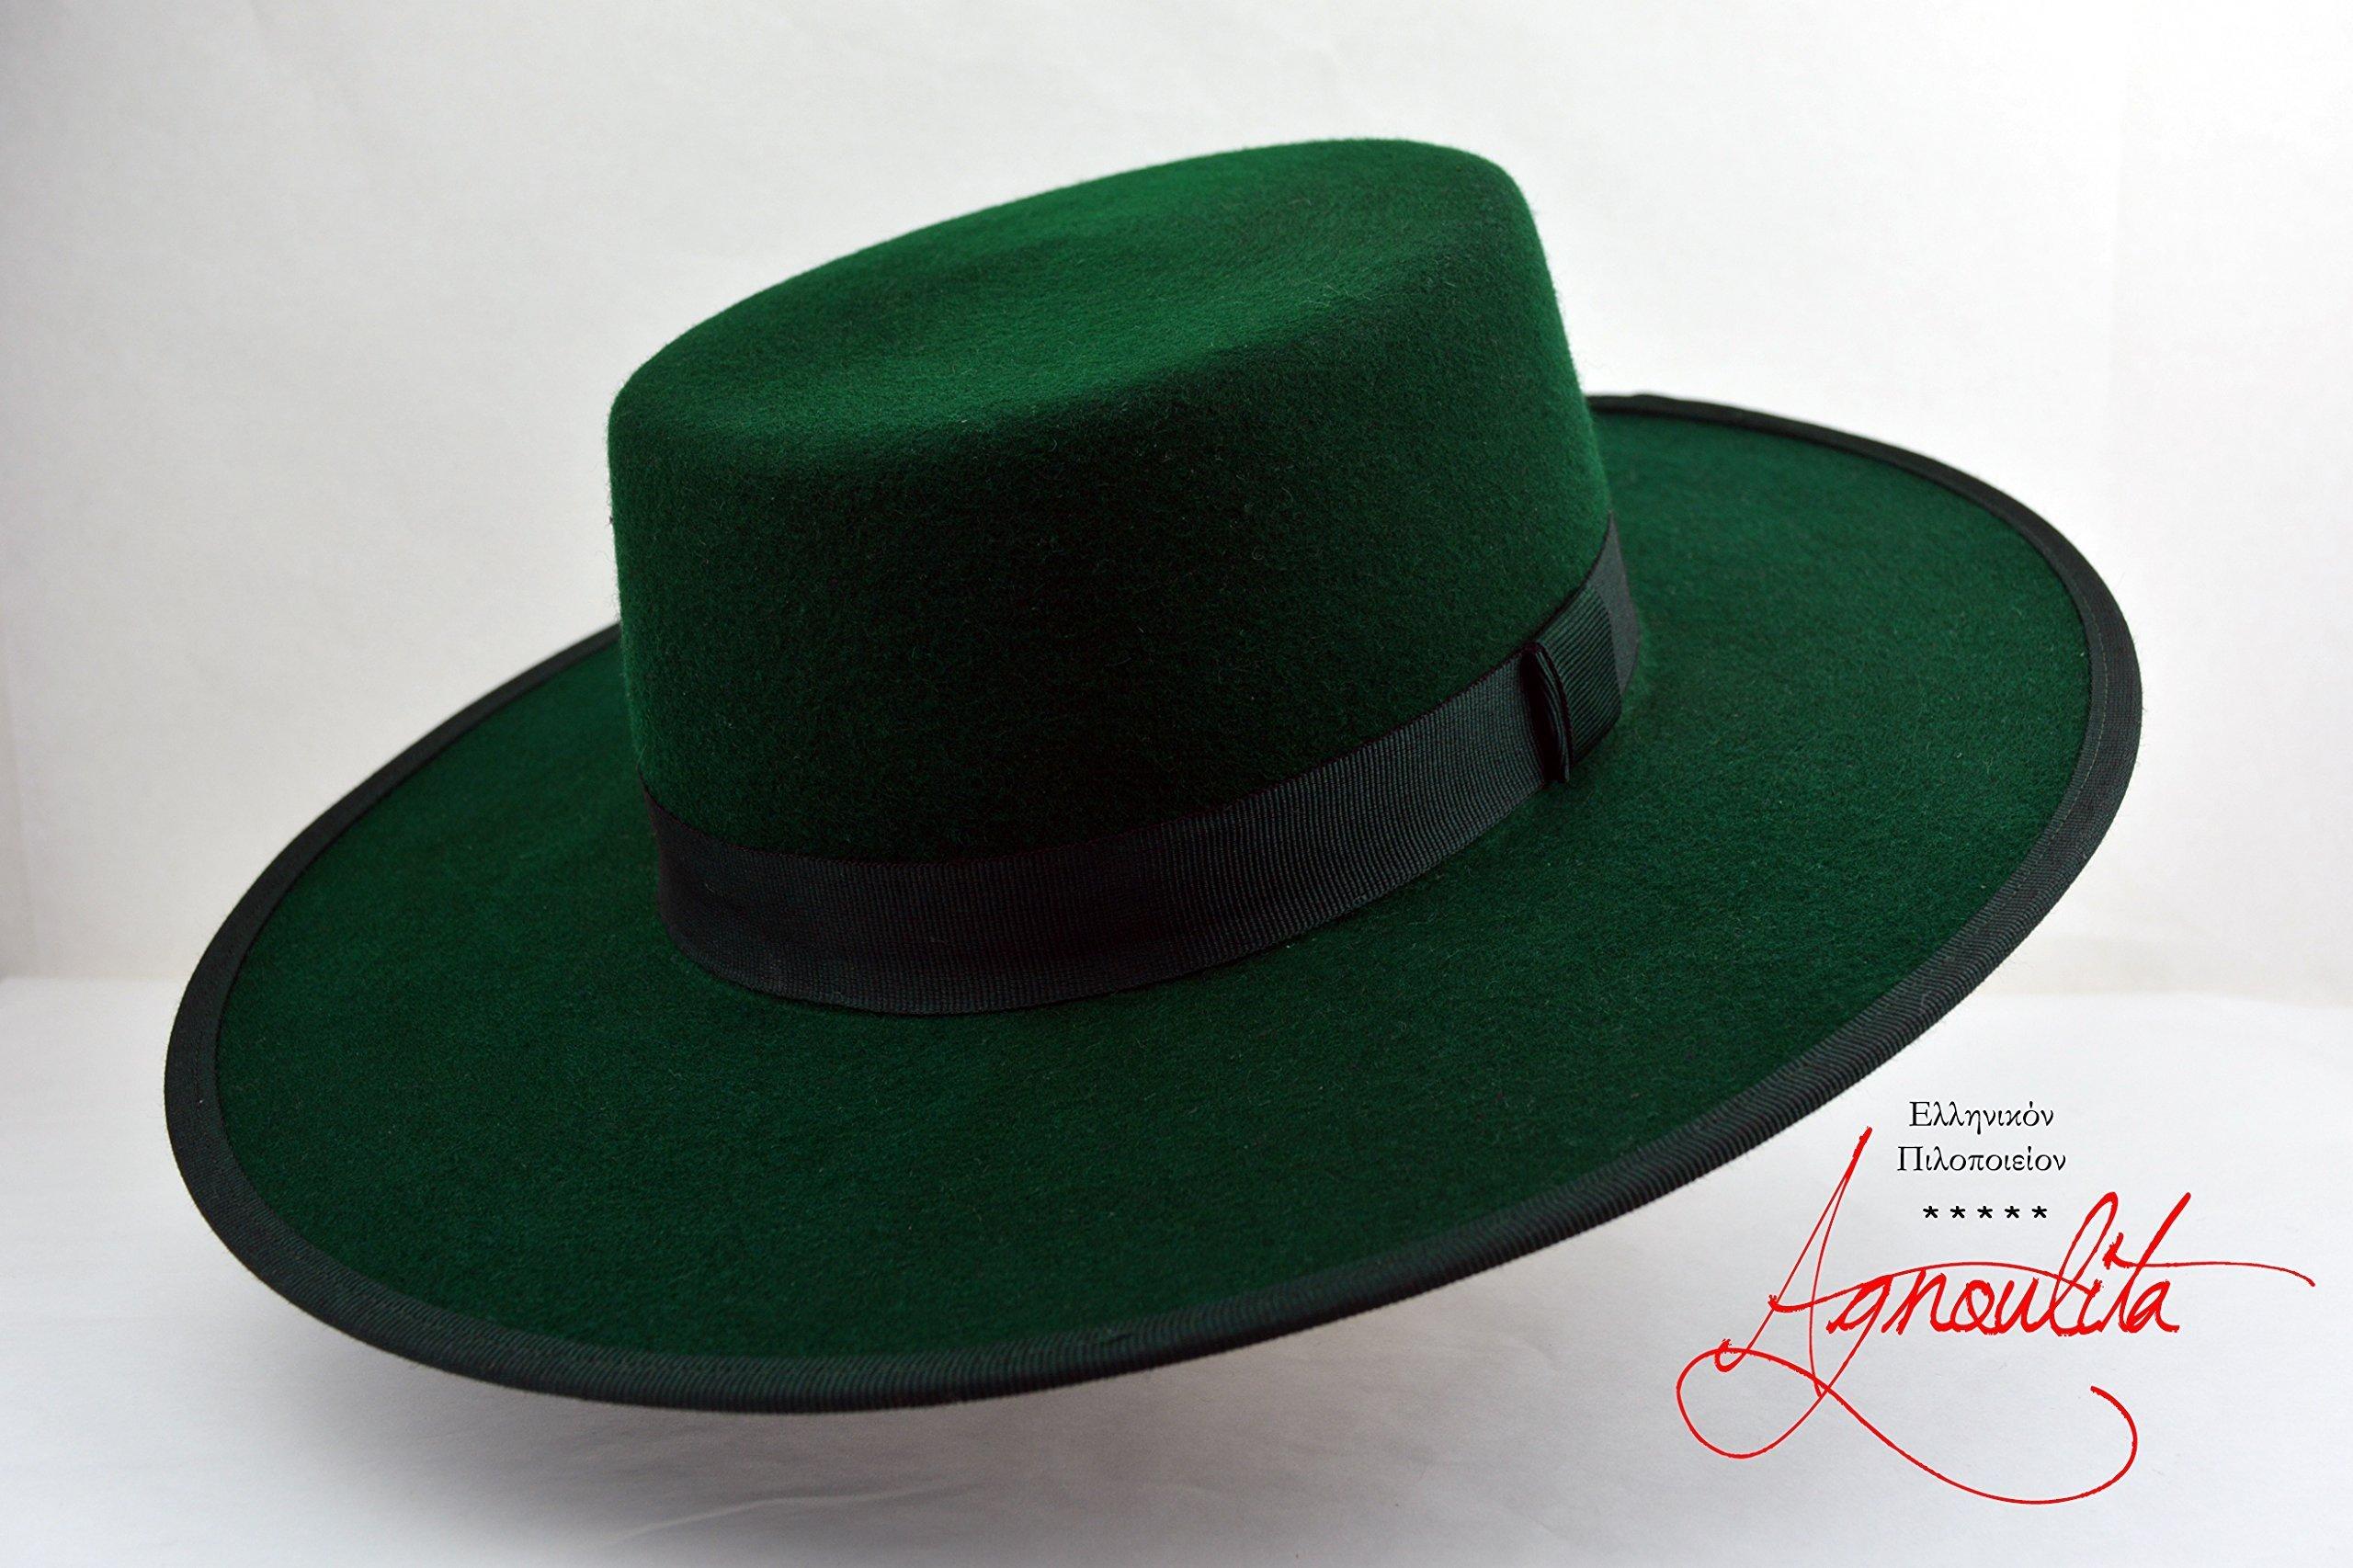 Emerald Green Bolero - Wide Brim Flat Crown Wool Felt Bolero Hat